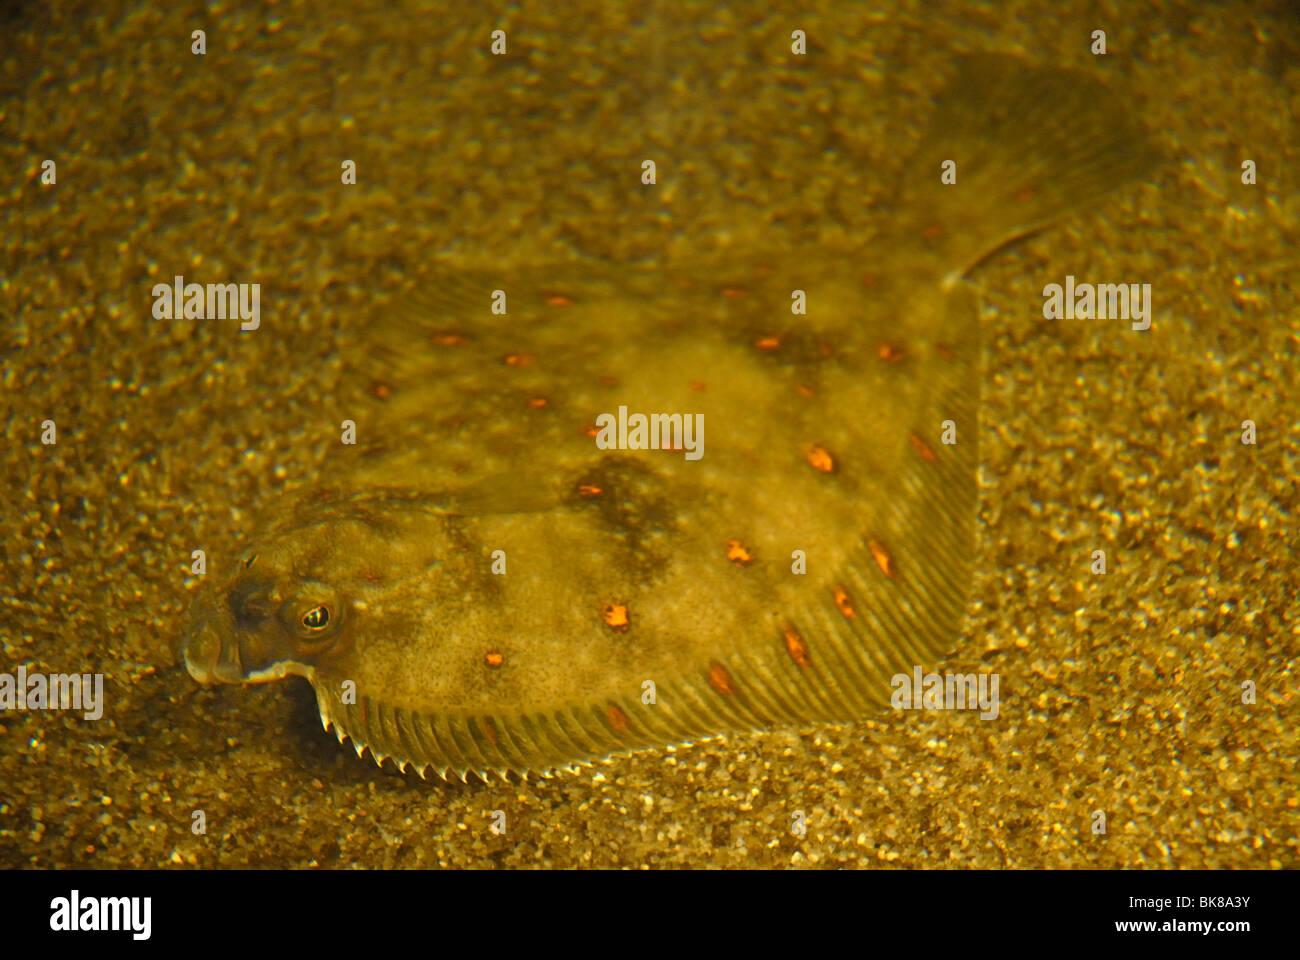 Scholle, Scholle (pleuronectes platessa) Stockbild